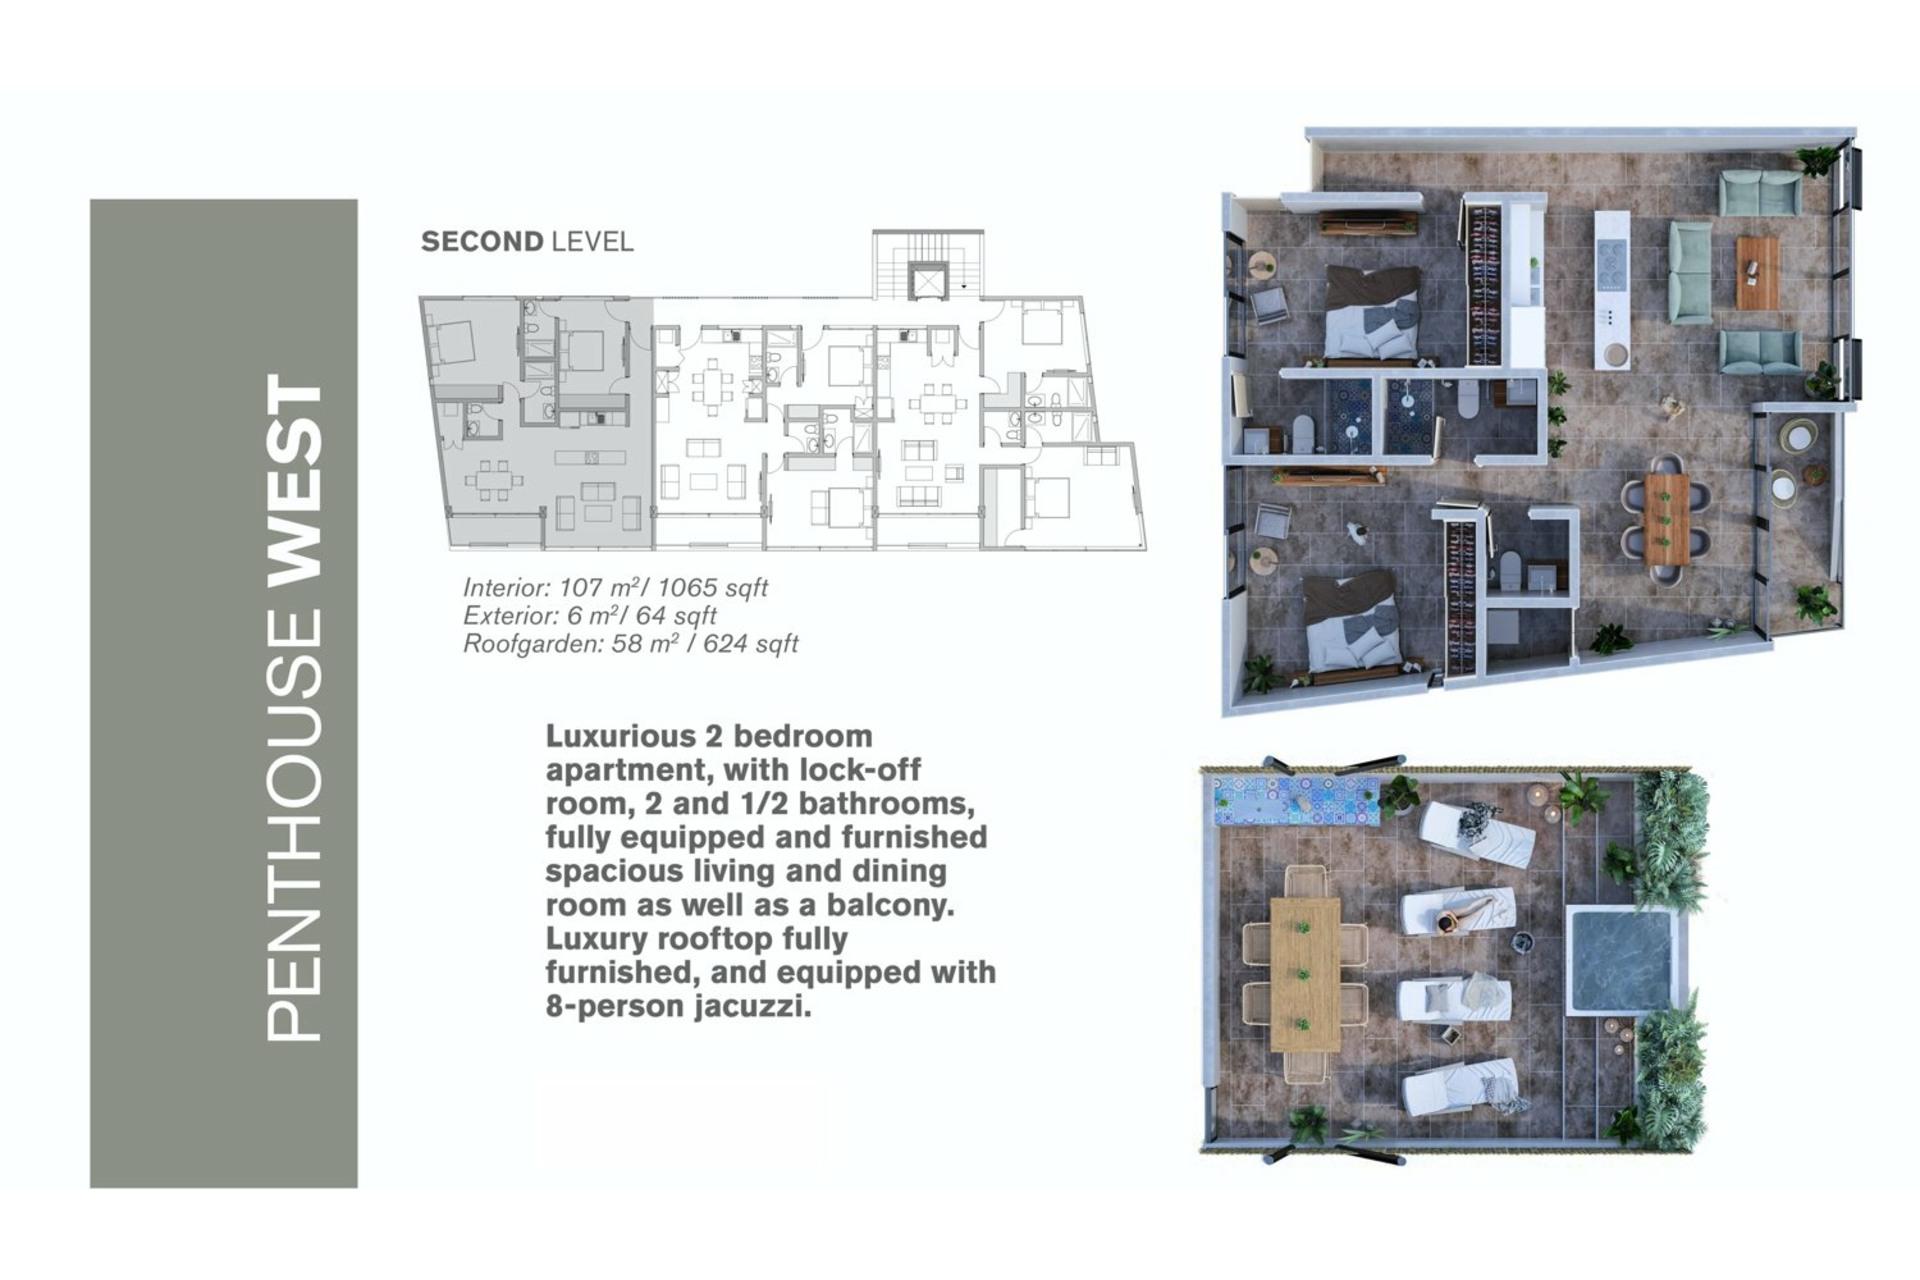 image 7 - Apartment For sale Autres pays - 7 rooms